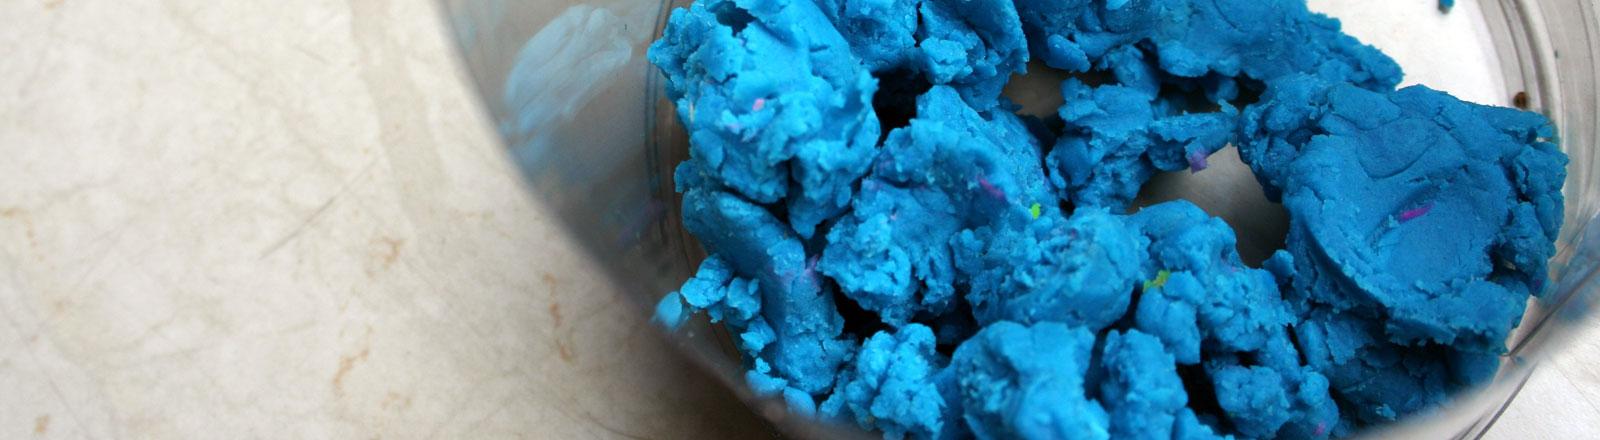 Blaue Knete